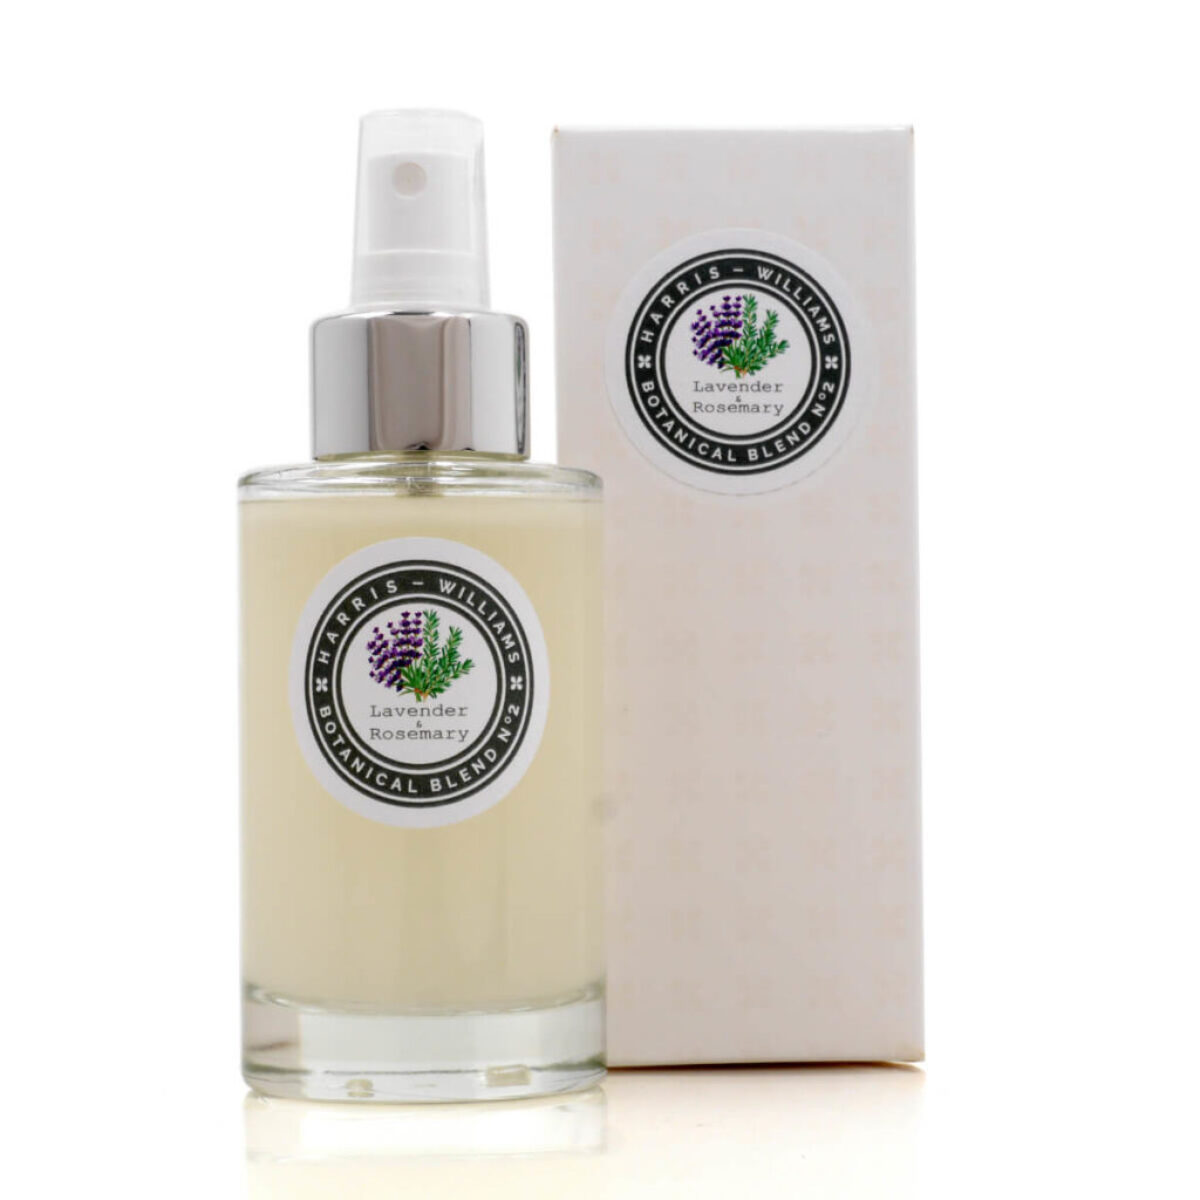 Botanical Blend No 2 Lavender & Rosemary Diffuser Room & Fabric Spray